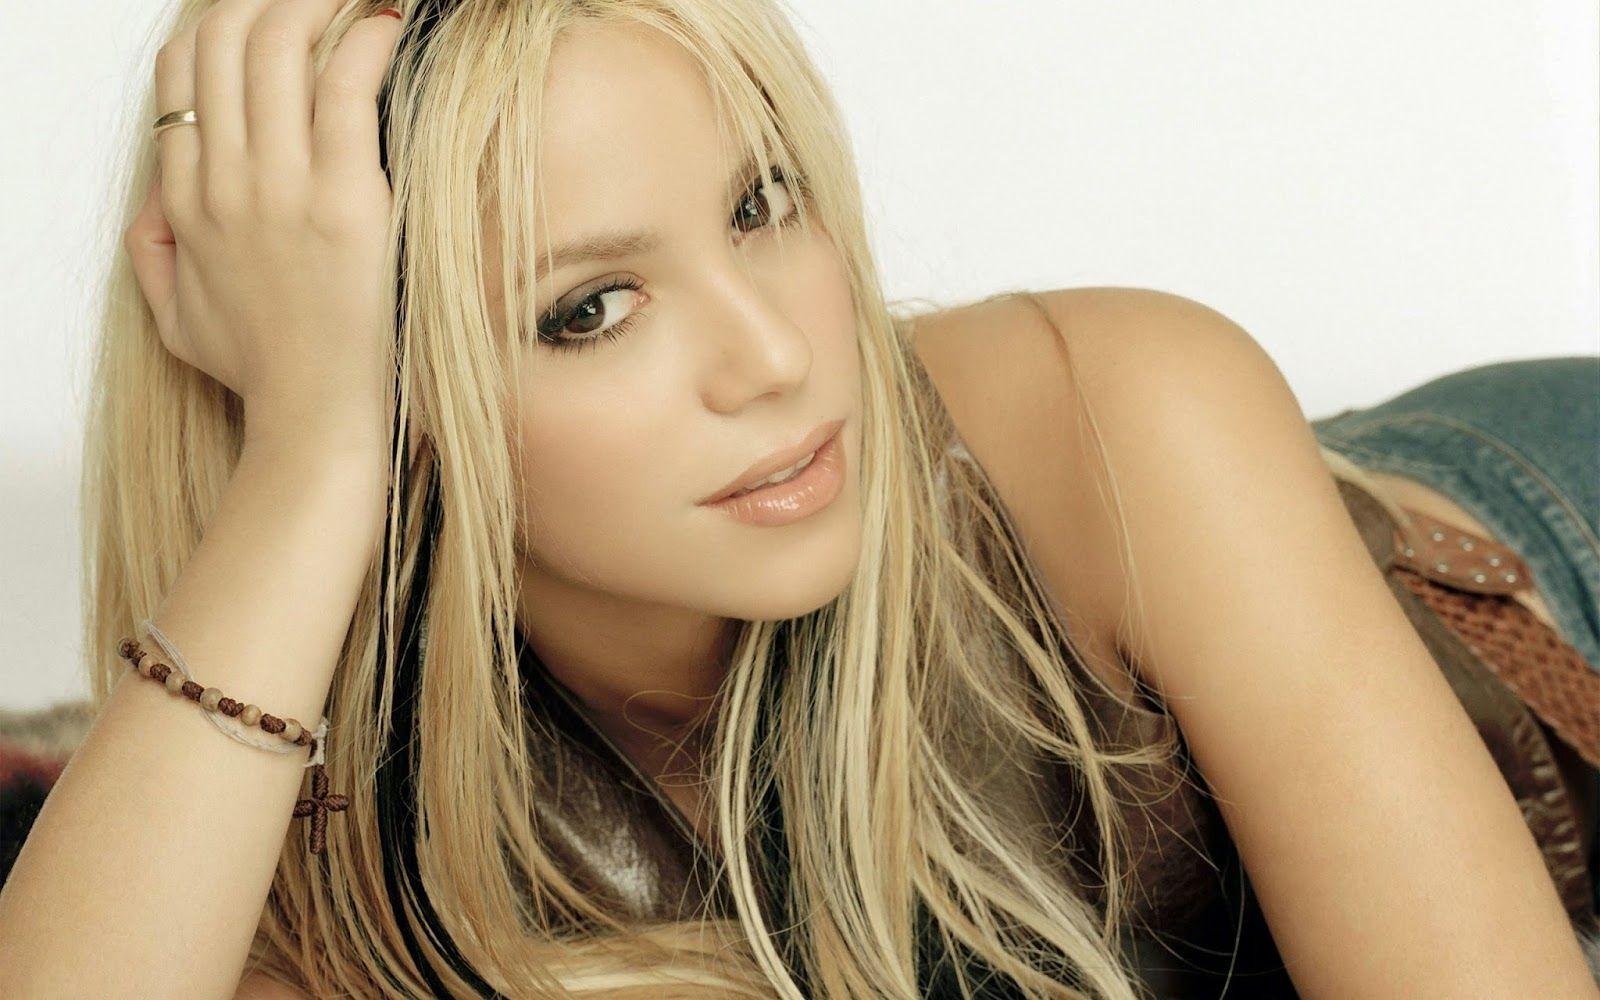 Famous Singer Shakira Hd Free Desktop Wallpaper Download